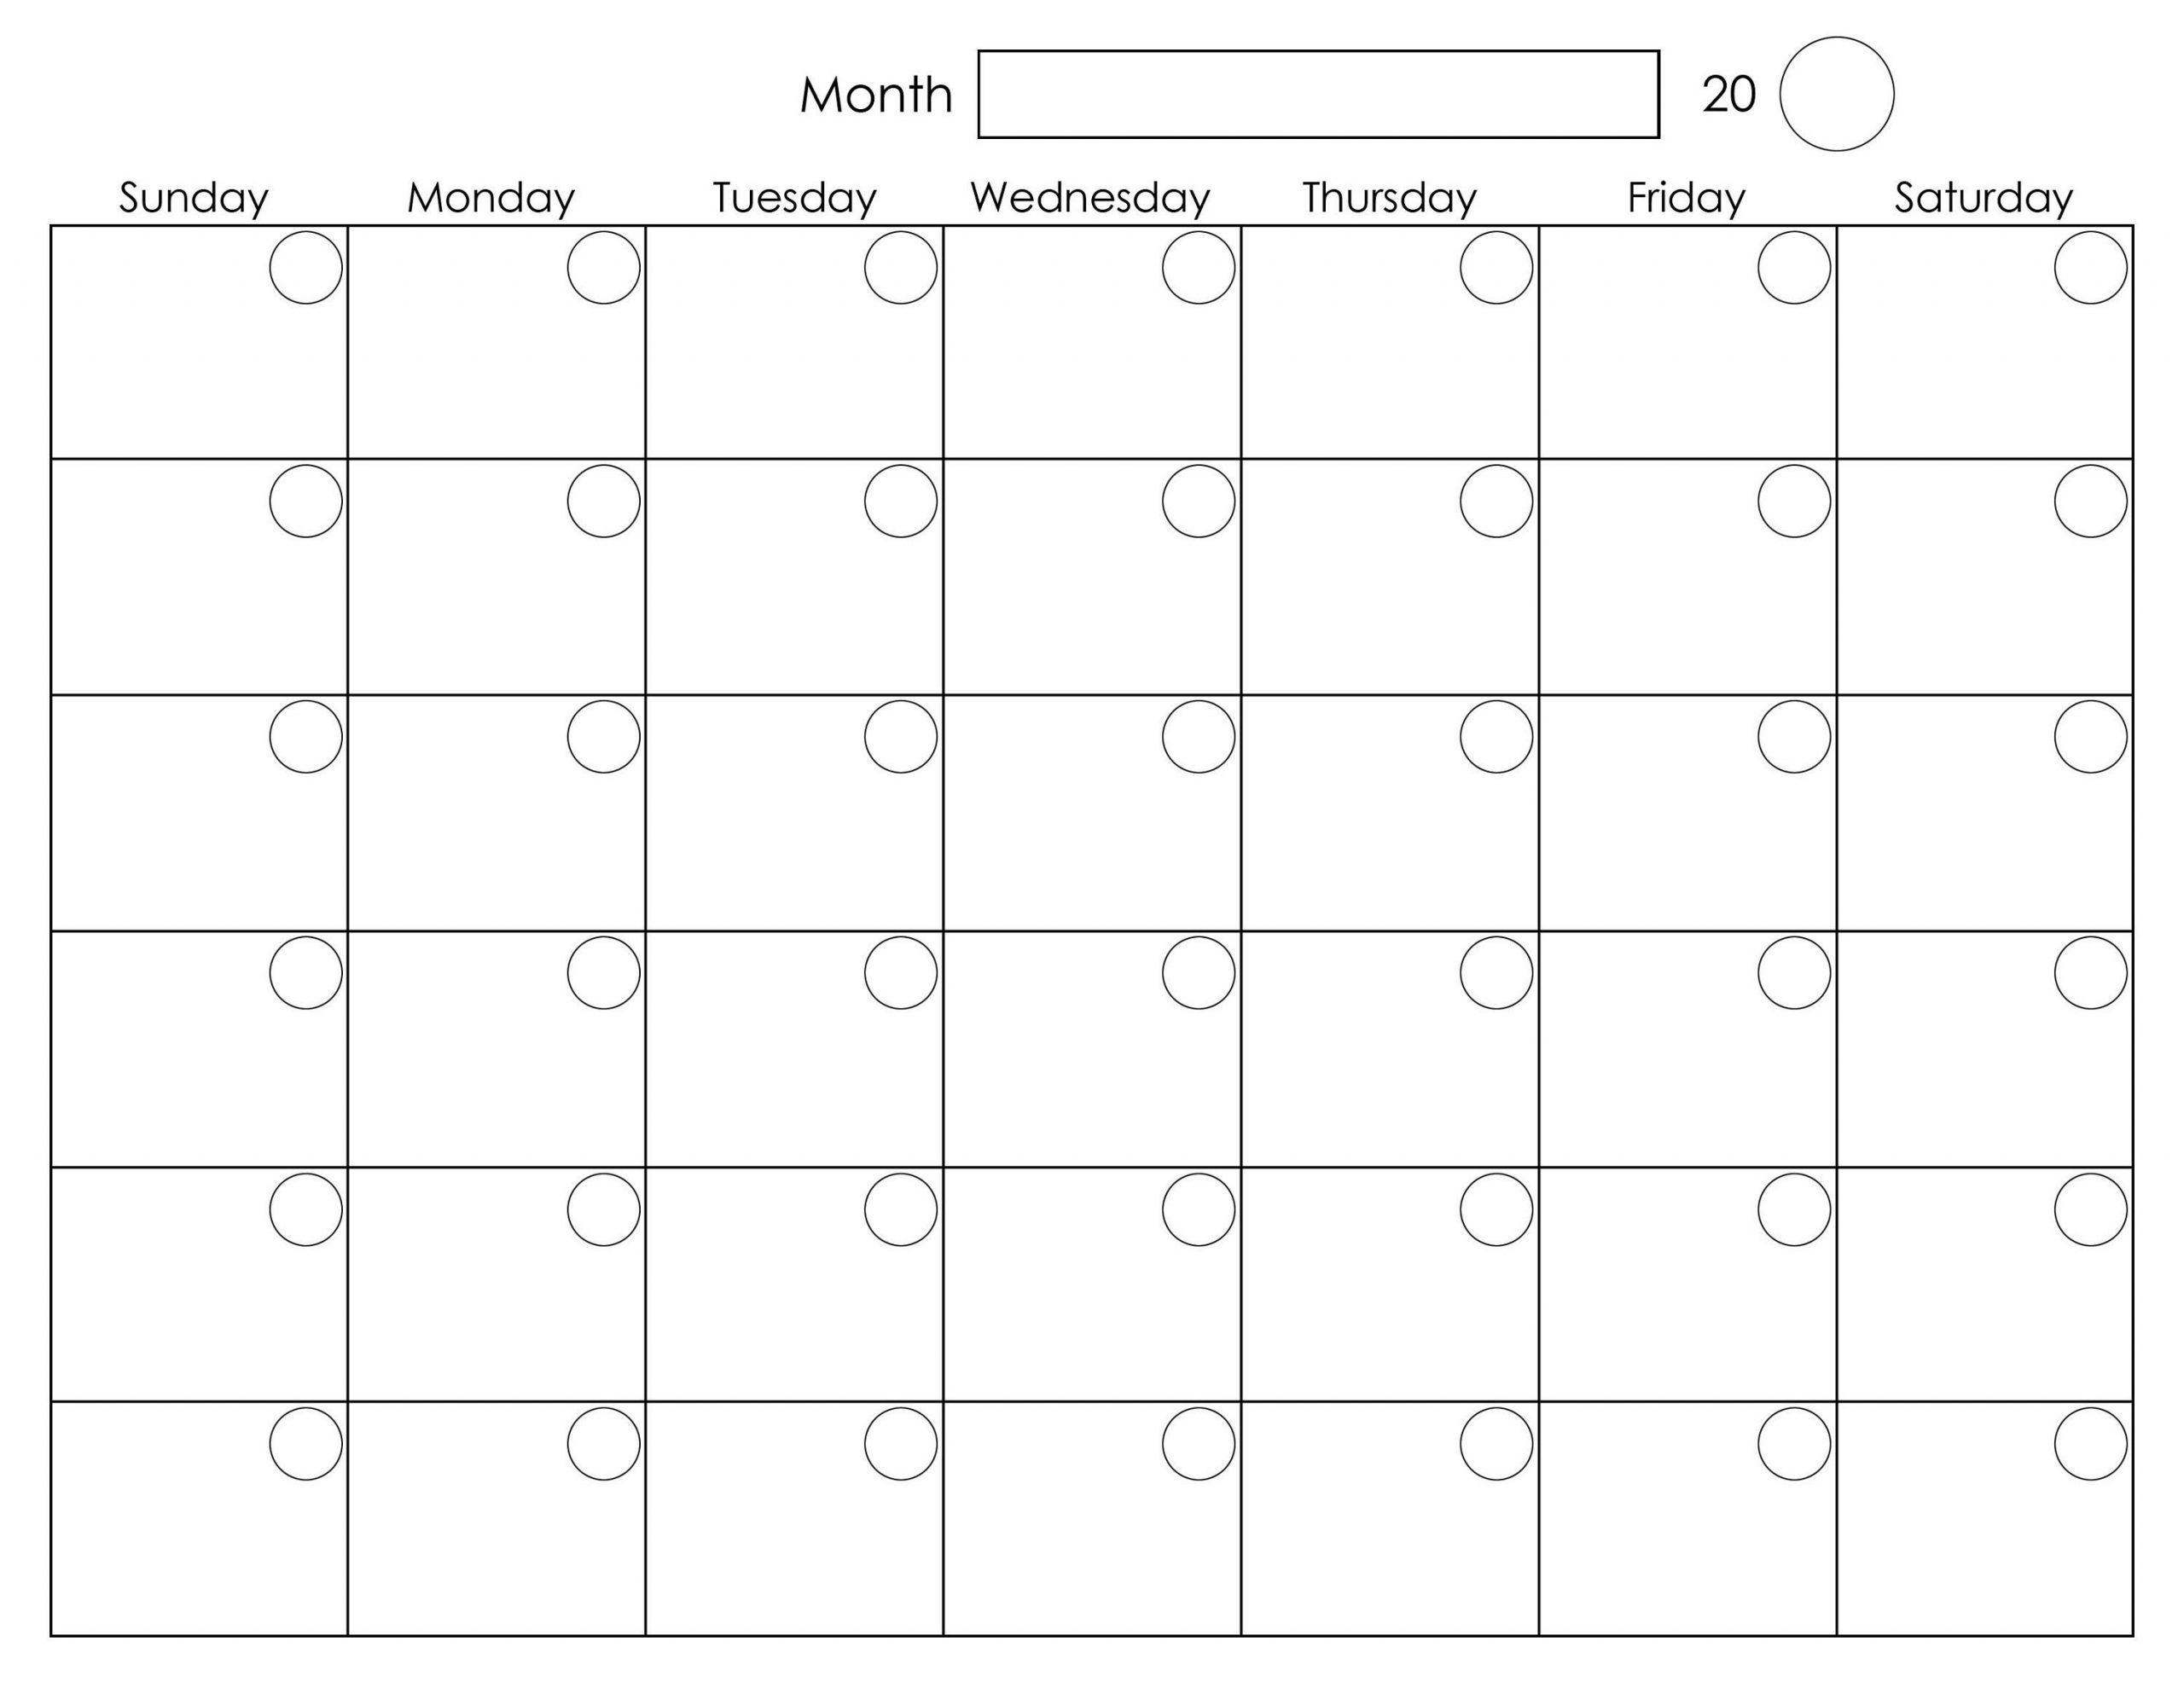 Calendar Three Months To View Printable   Example Calendar 3 Month Calendar Template Printable